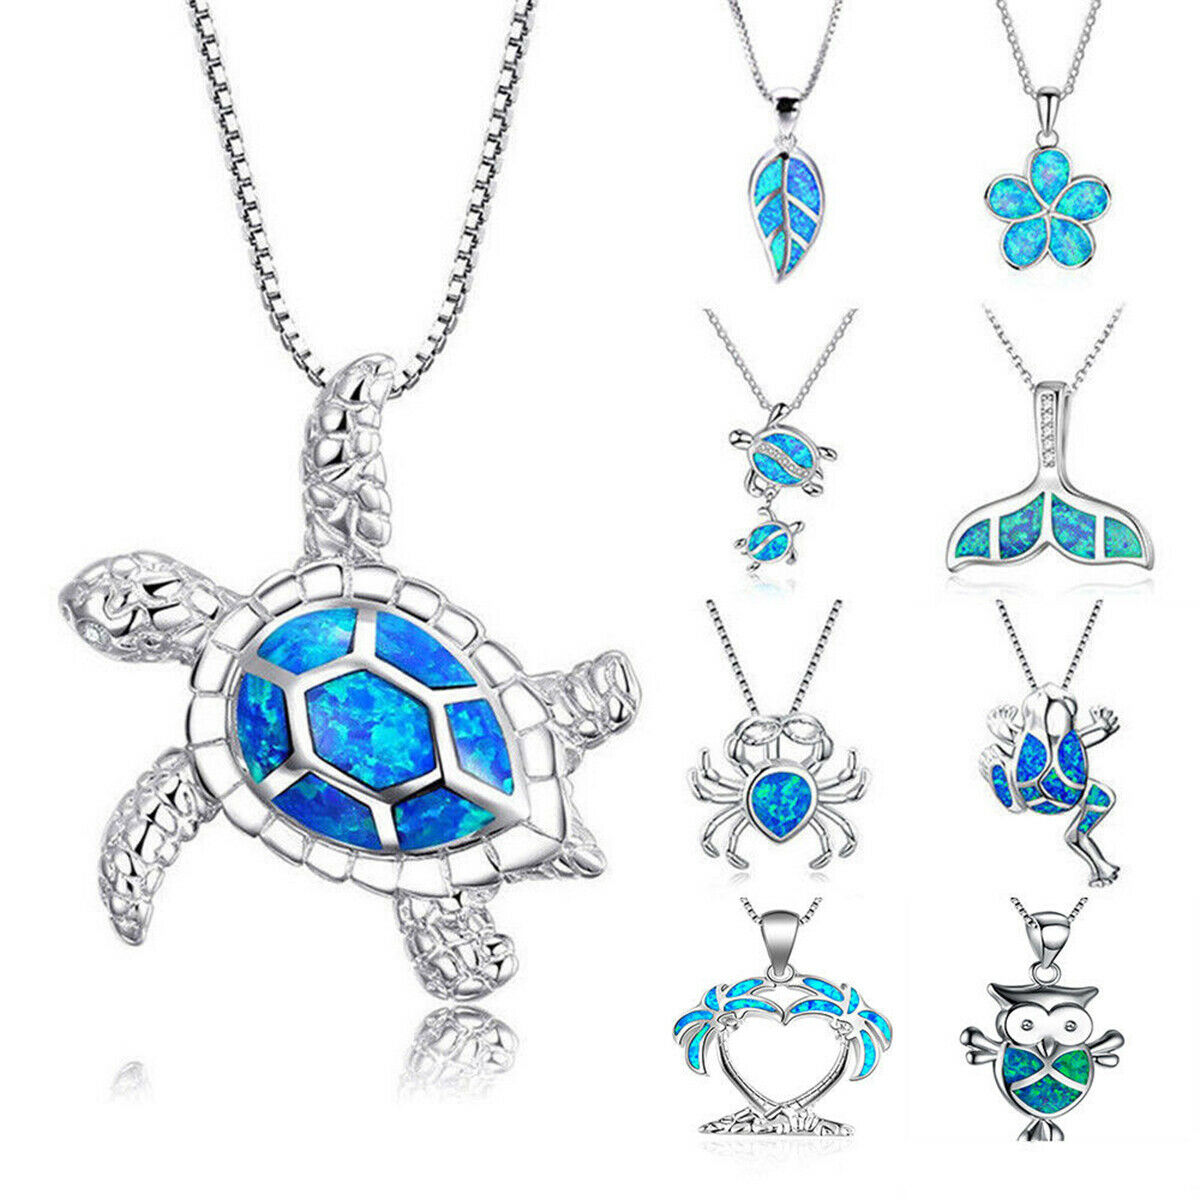 Jewellery - Cute Sea Animal Turtle Pendant Necklace Silver Blue Fire Opal Jewelry Gift